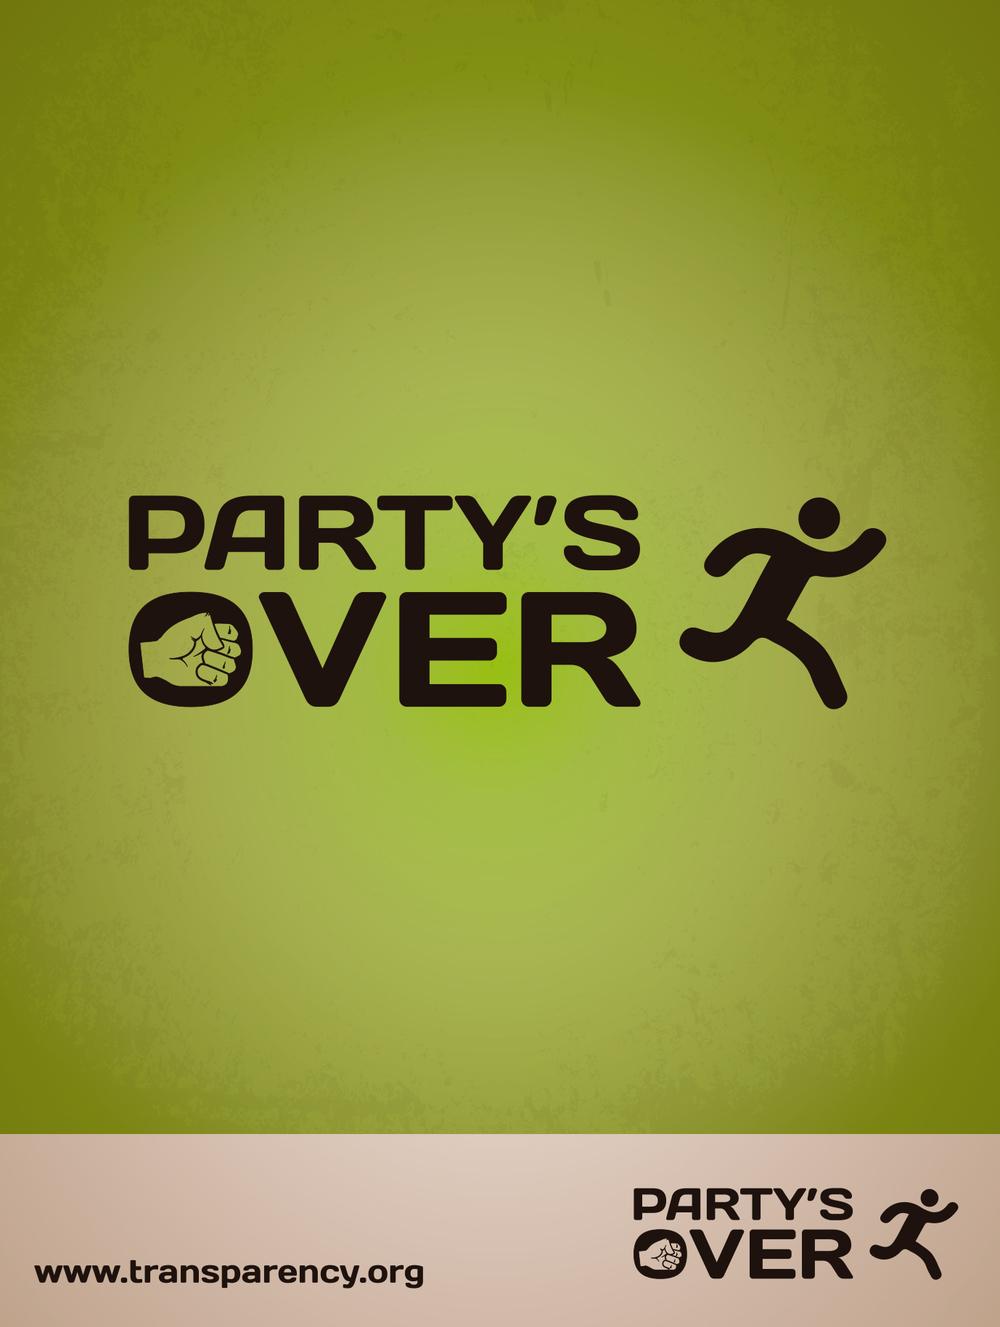 Party 5 1 bigger